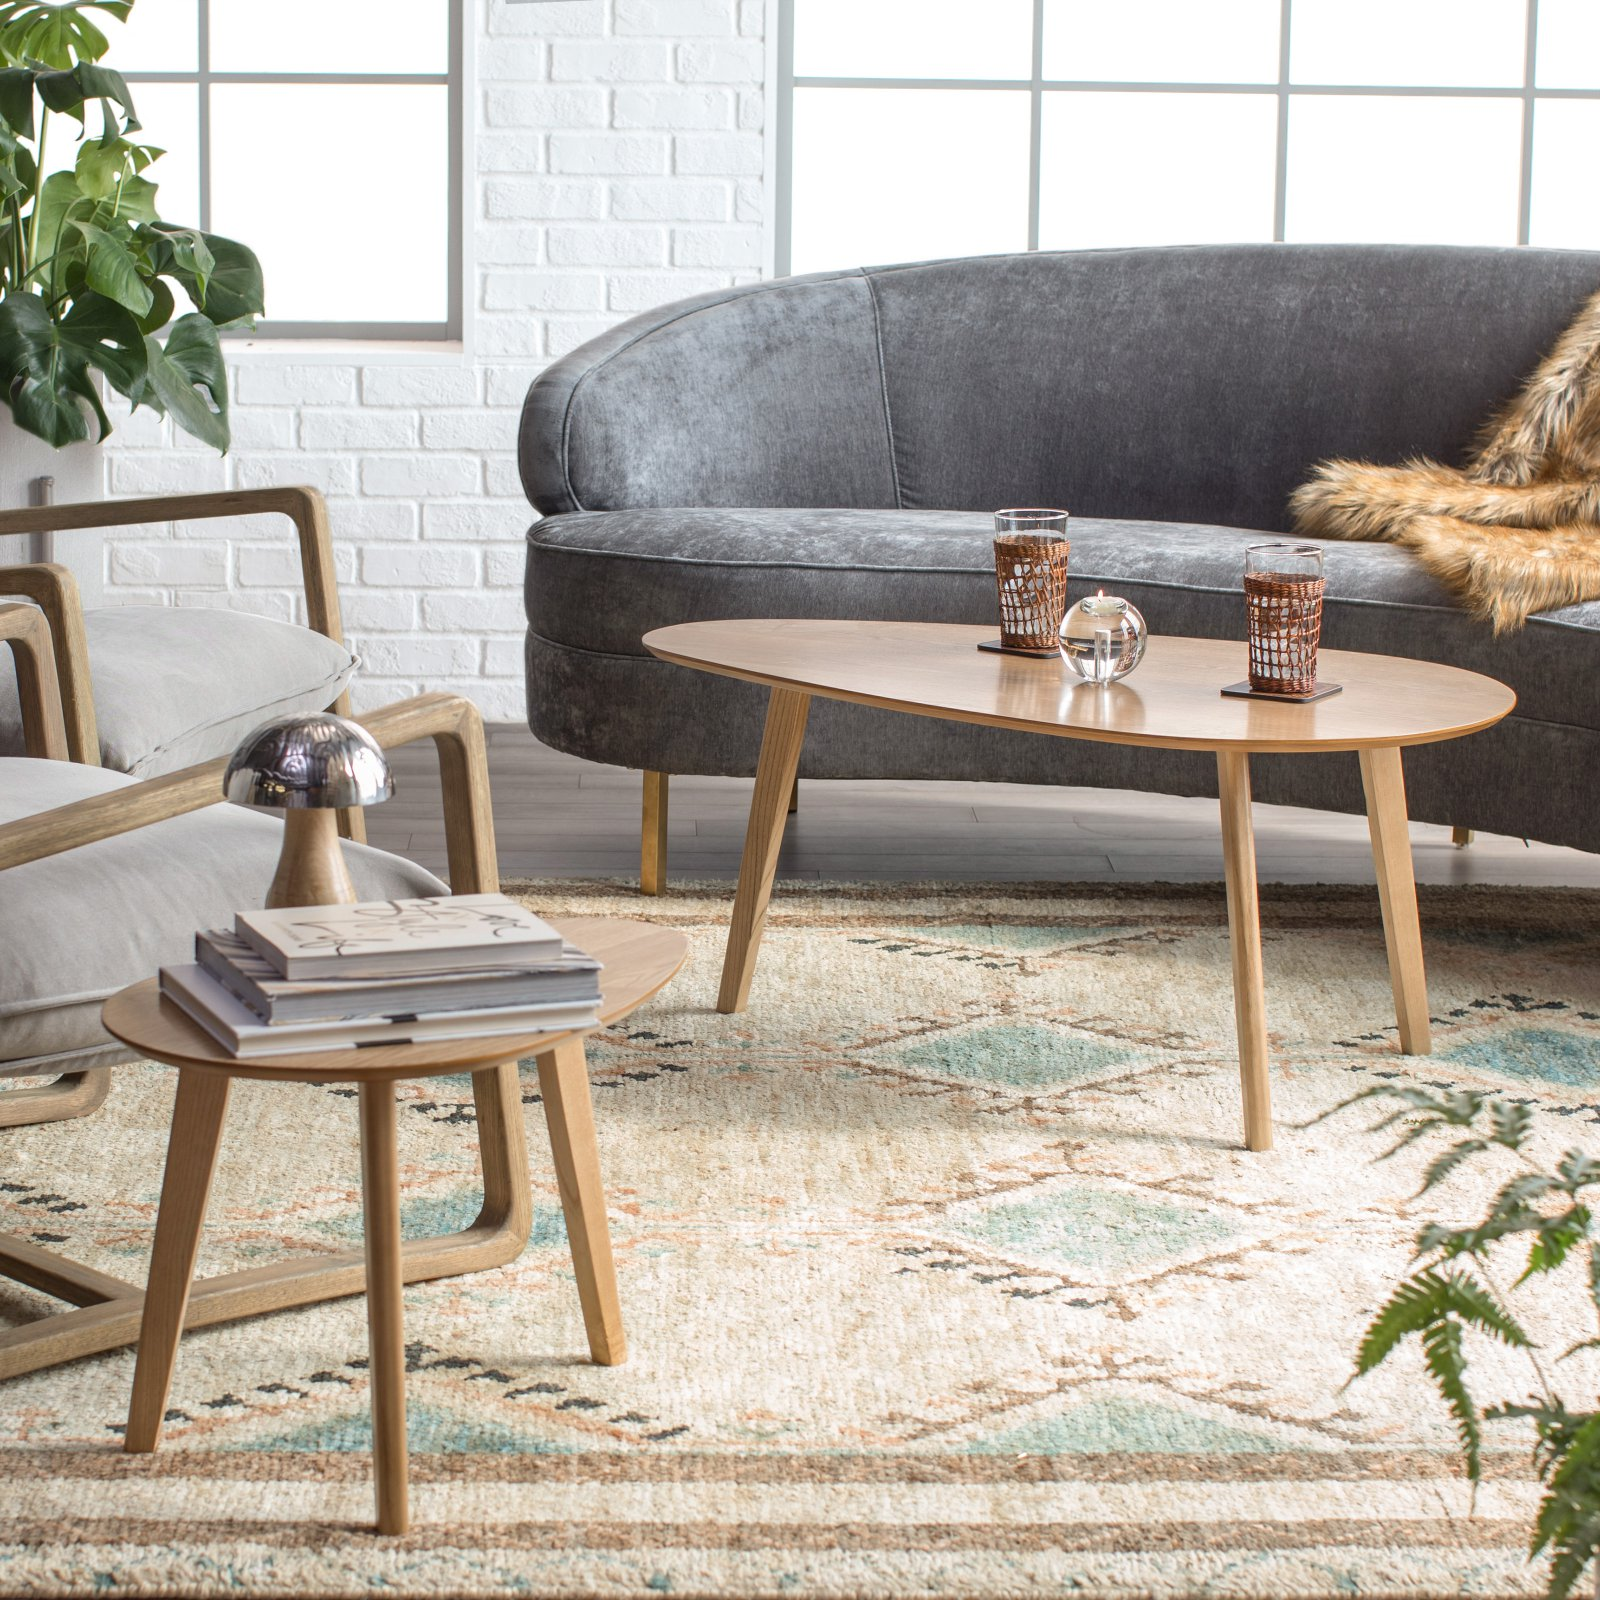 Finley Home Raymore Mid Century Modern Coffee Table Set Oblong Walmart Com Walmart Com